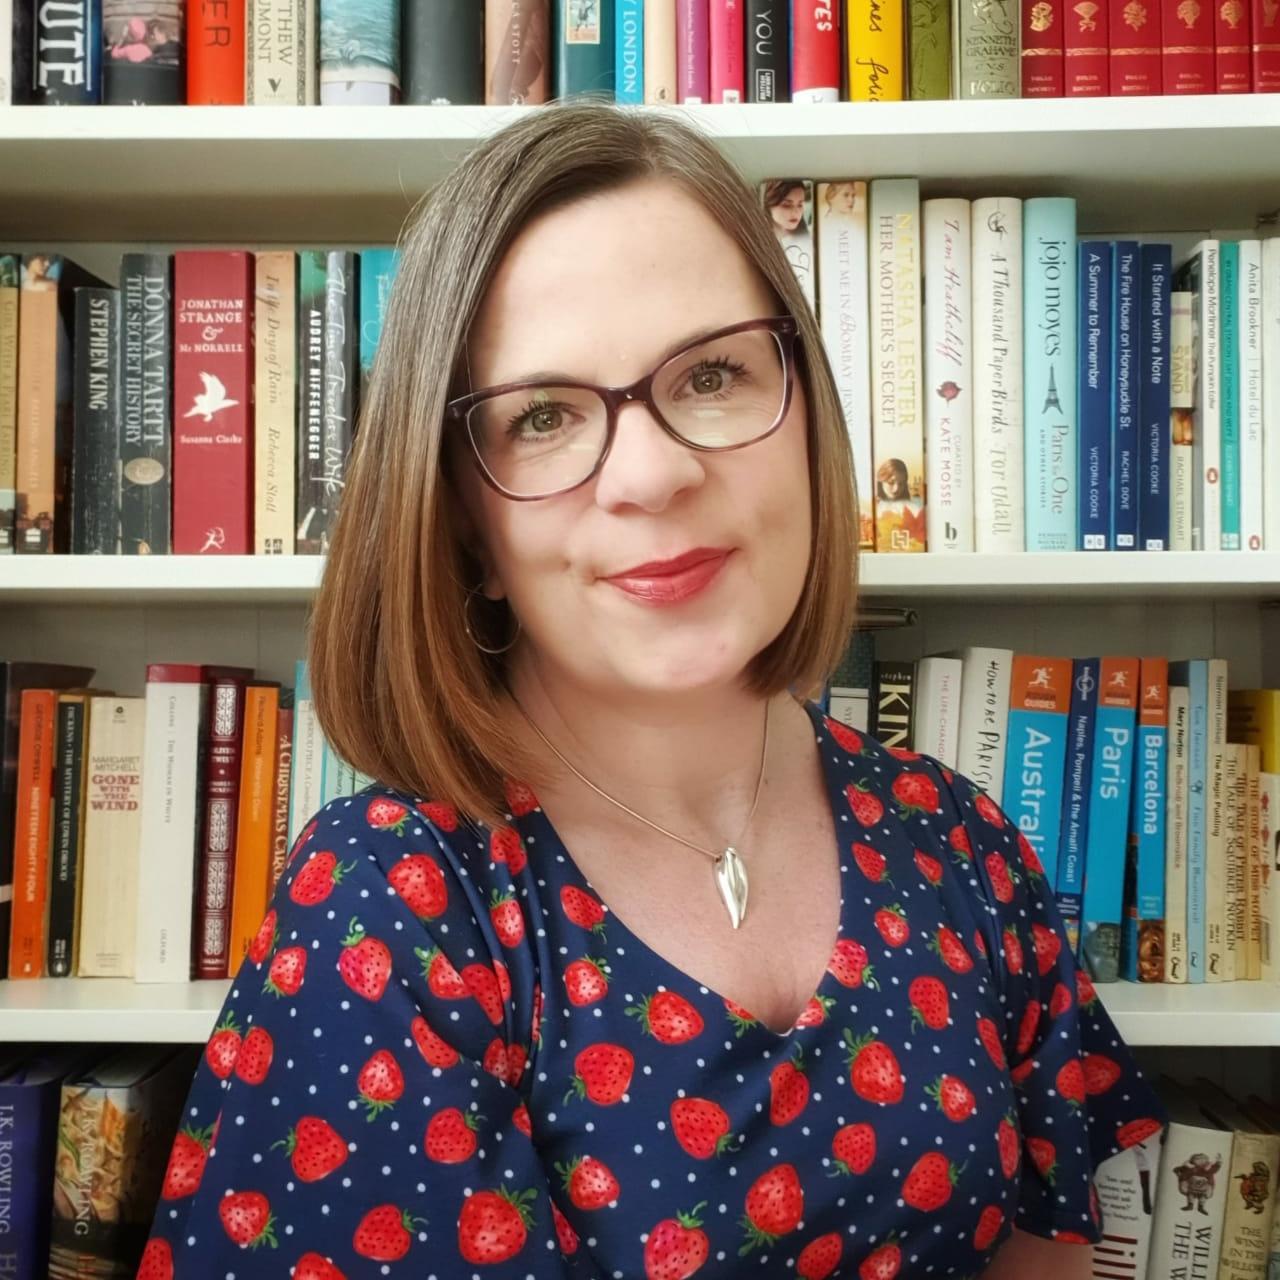 The Summer Rachel Burton Author Photo